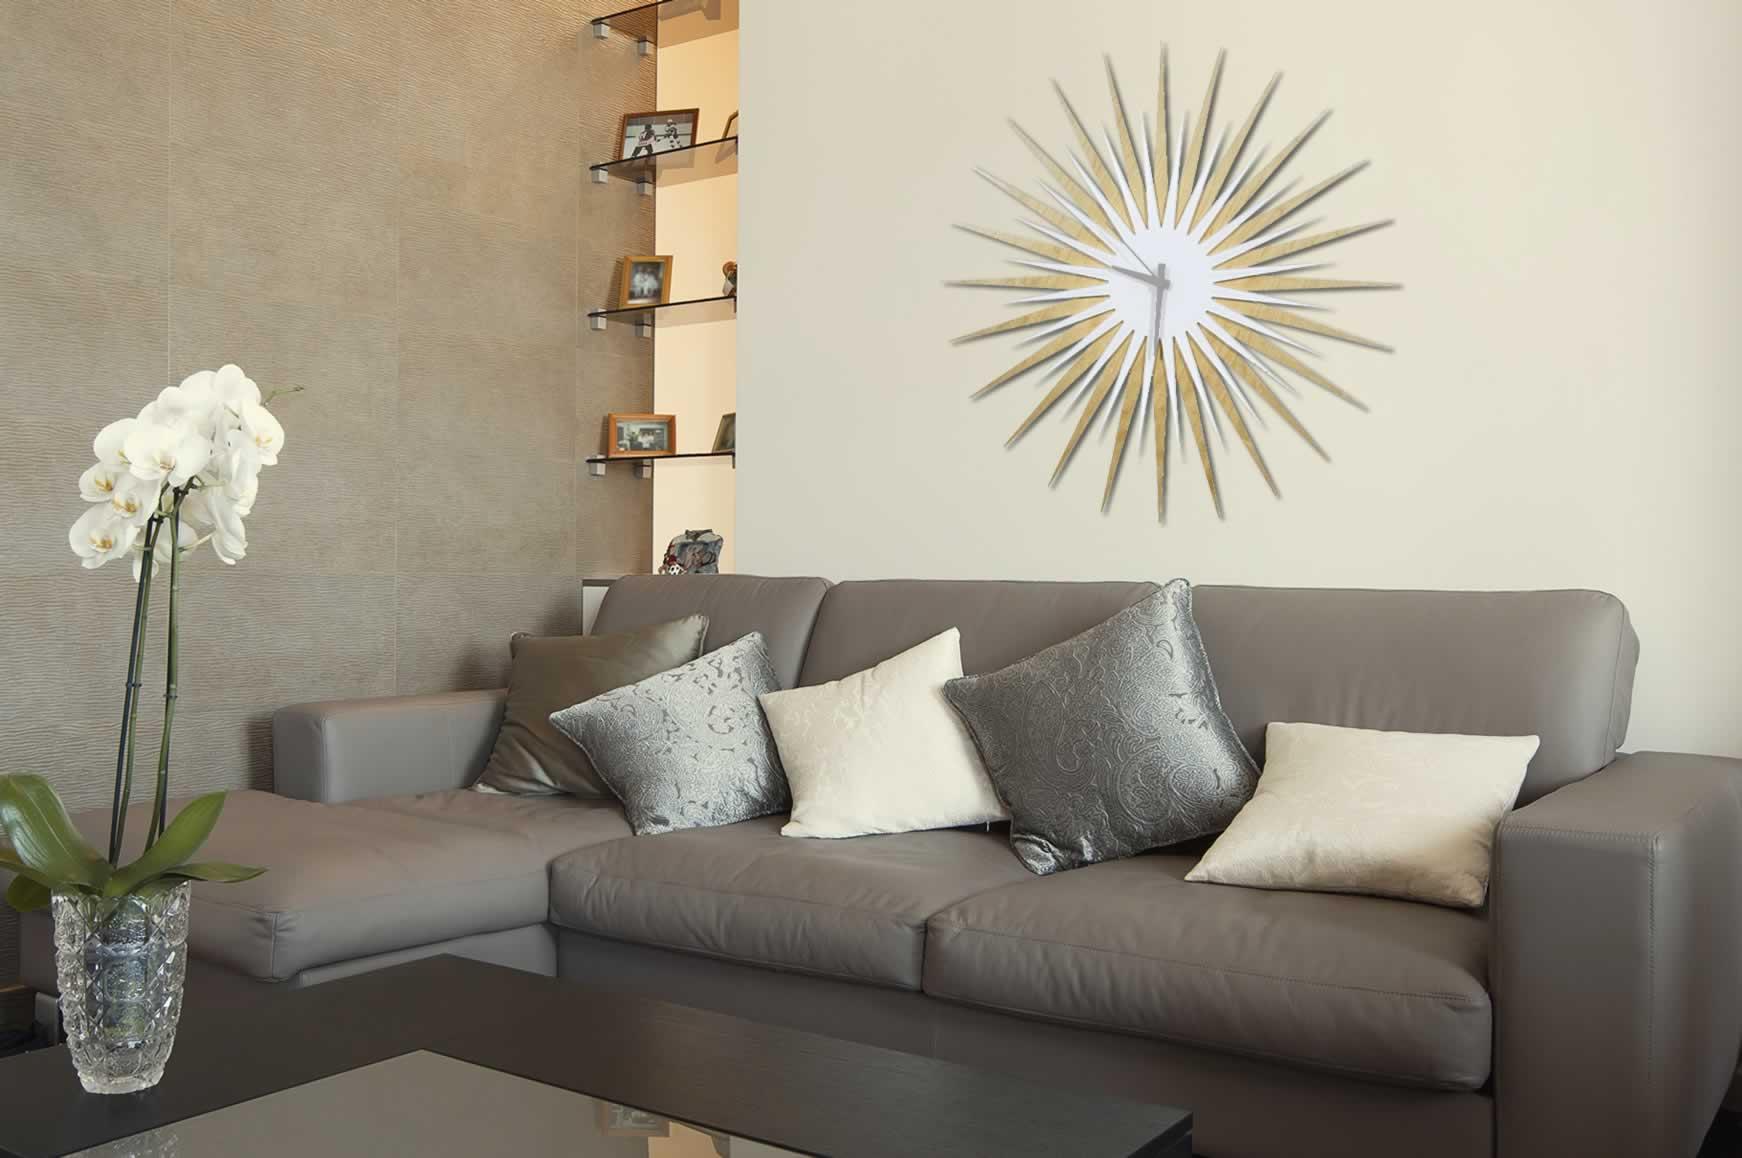 RF Atomic Clock - Maple White/Grey Starburst - Lifestyle Image